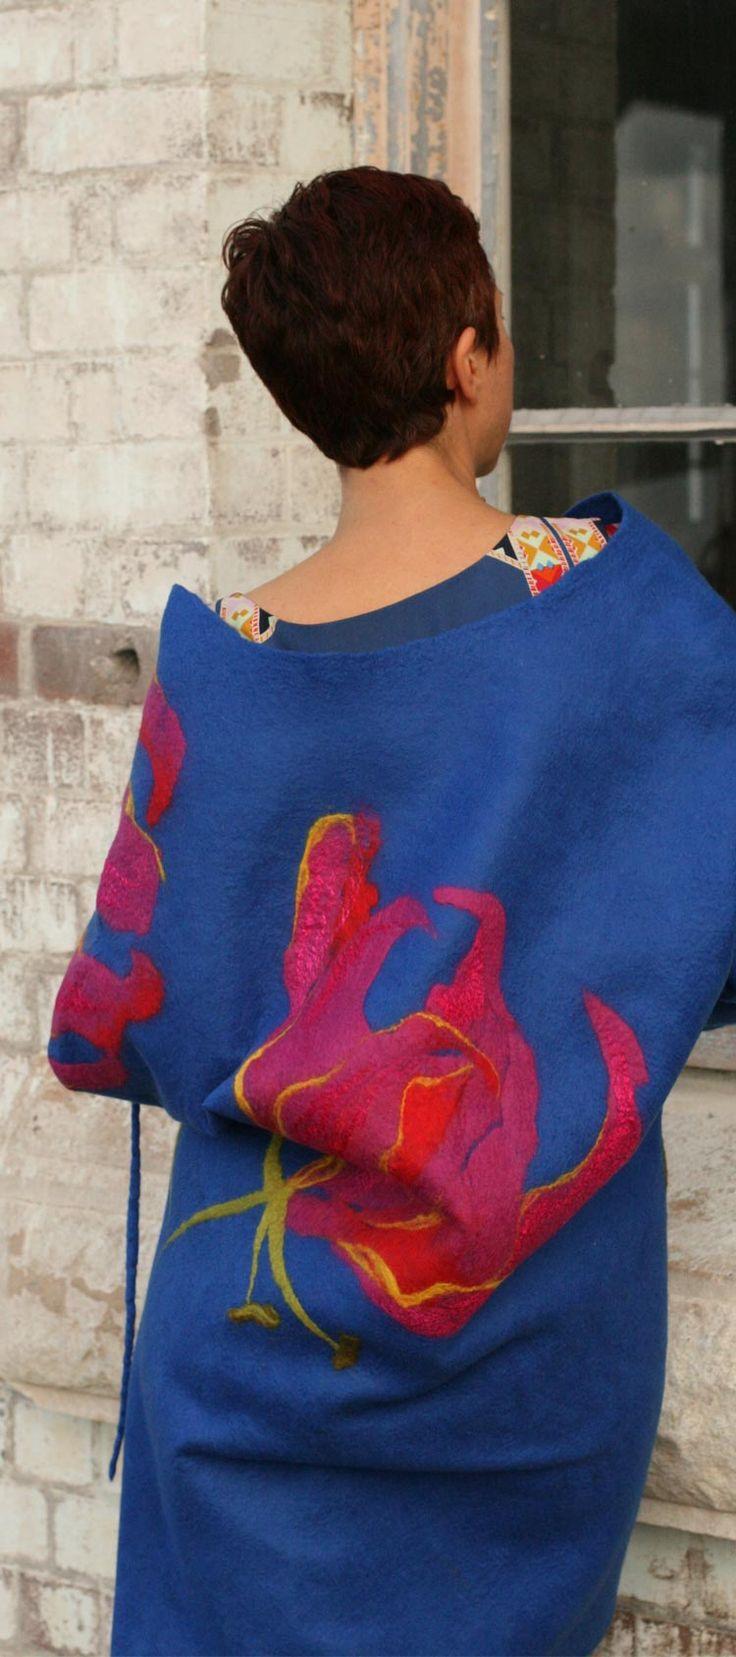 Buy eco-fashion style women's jacket by Vera Alexanderova #ecofashion #ecofriendly #womensfashion #unique #art #blue #coat #jacket #wool #felt #felted